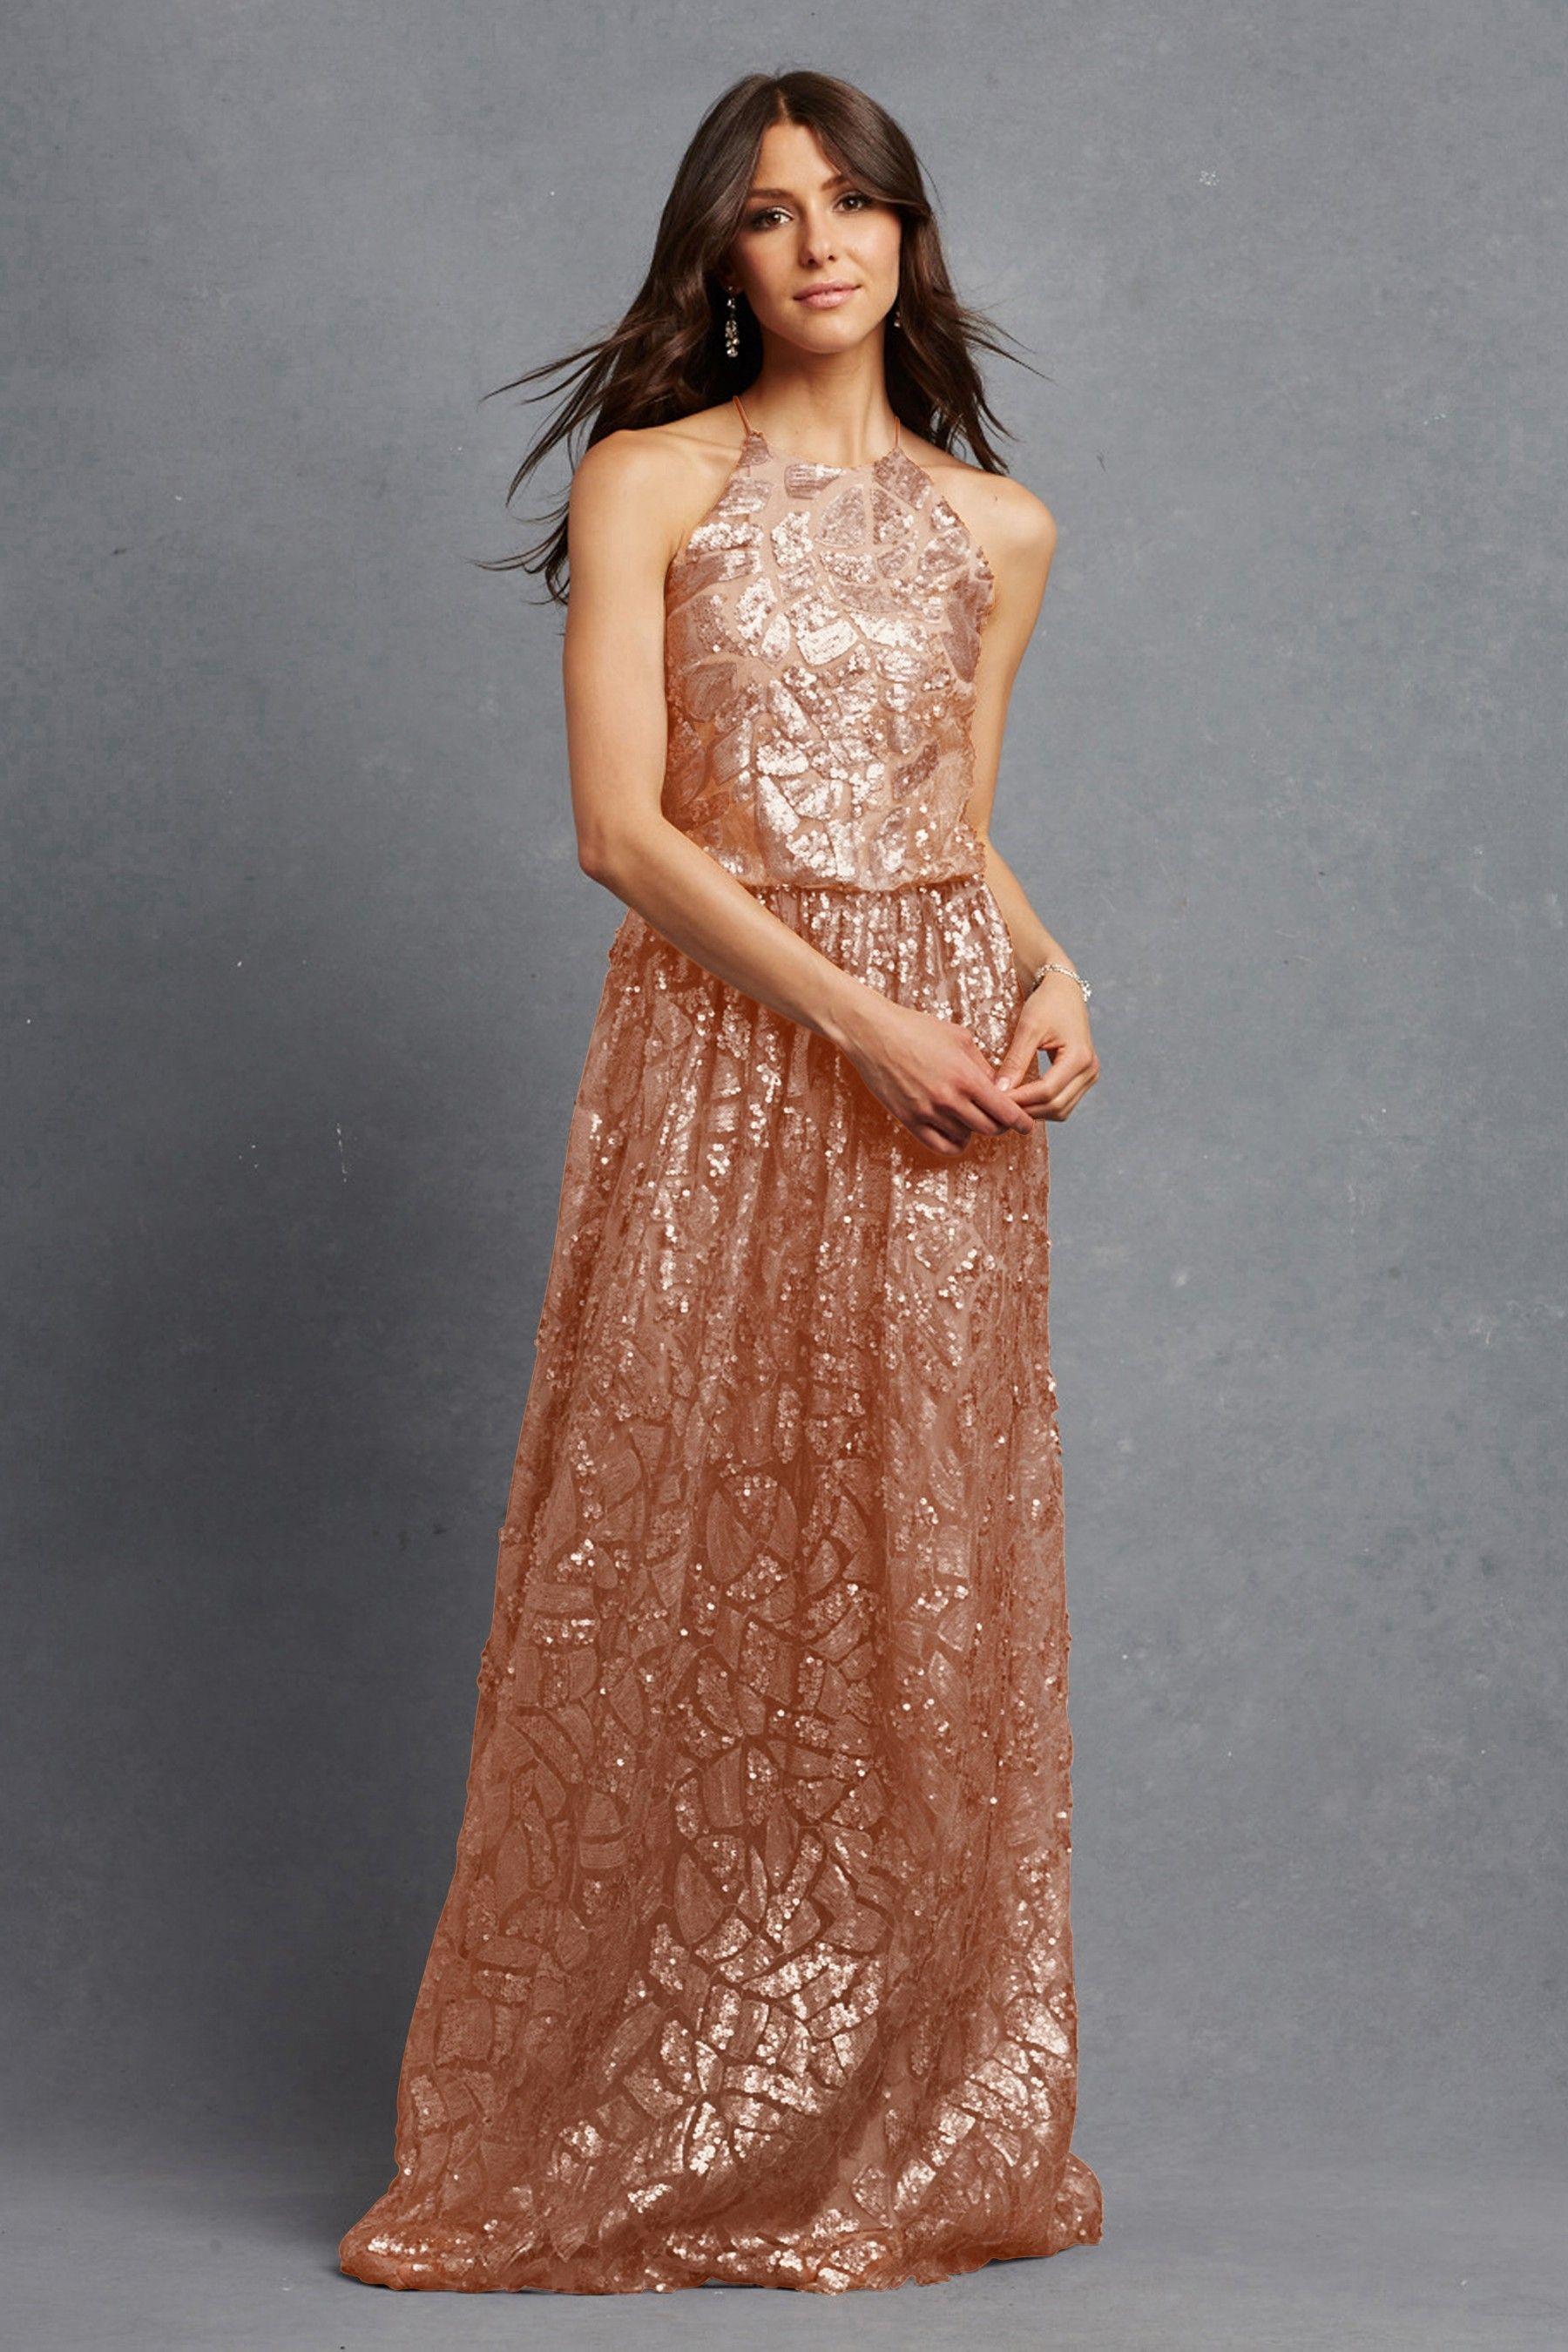 Donna morgan tiffany collection bridesmaid dresses for Donna morgan wedding dresses